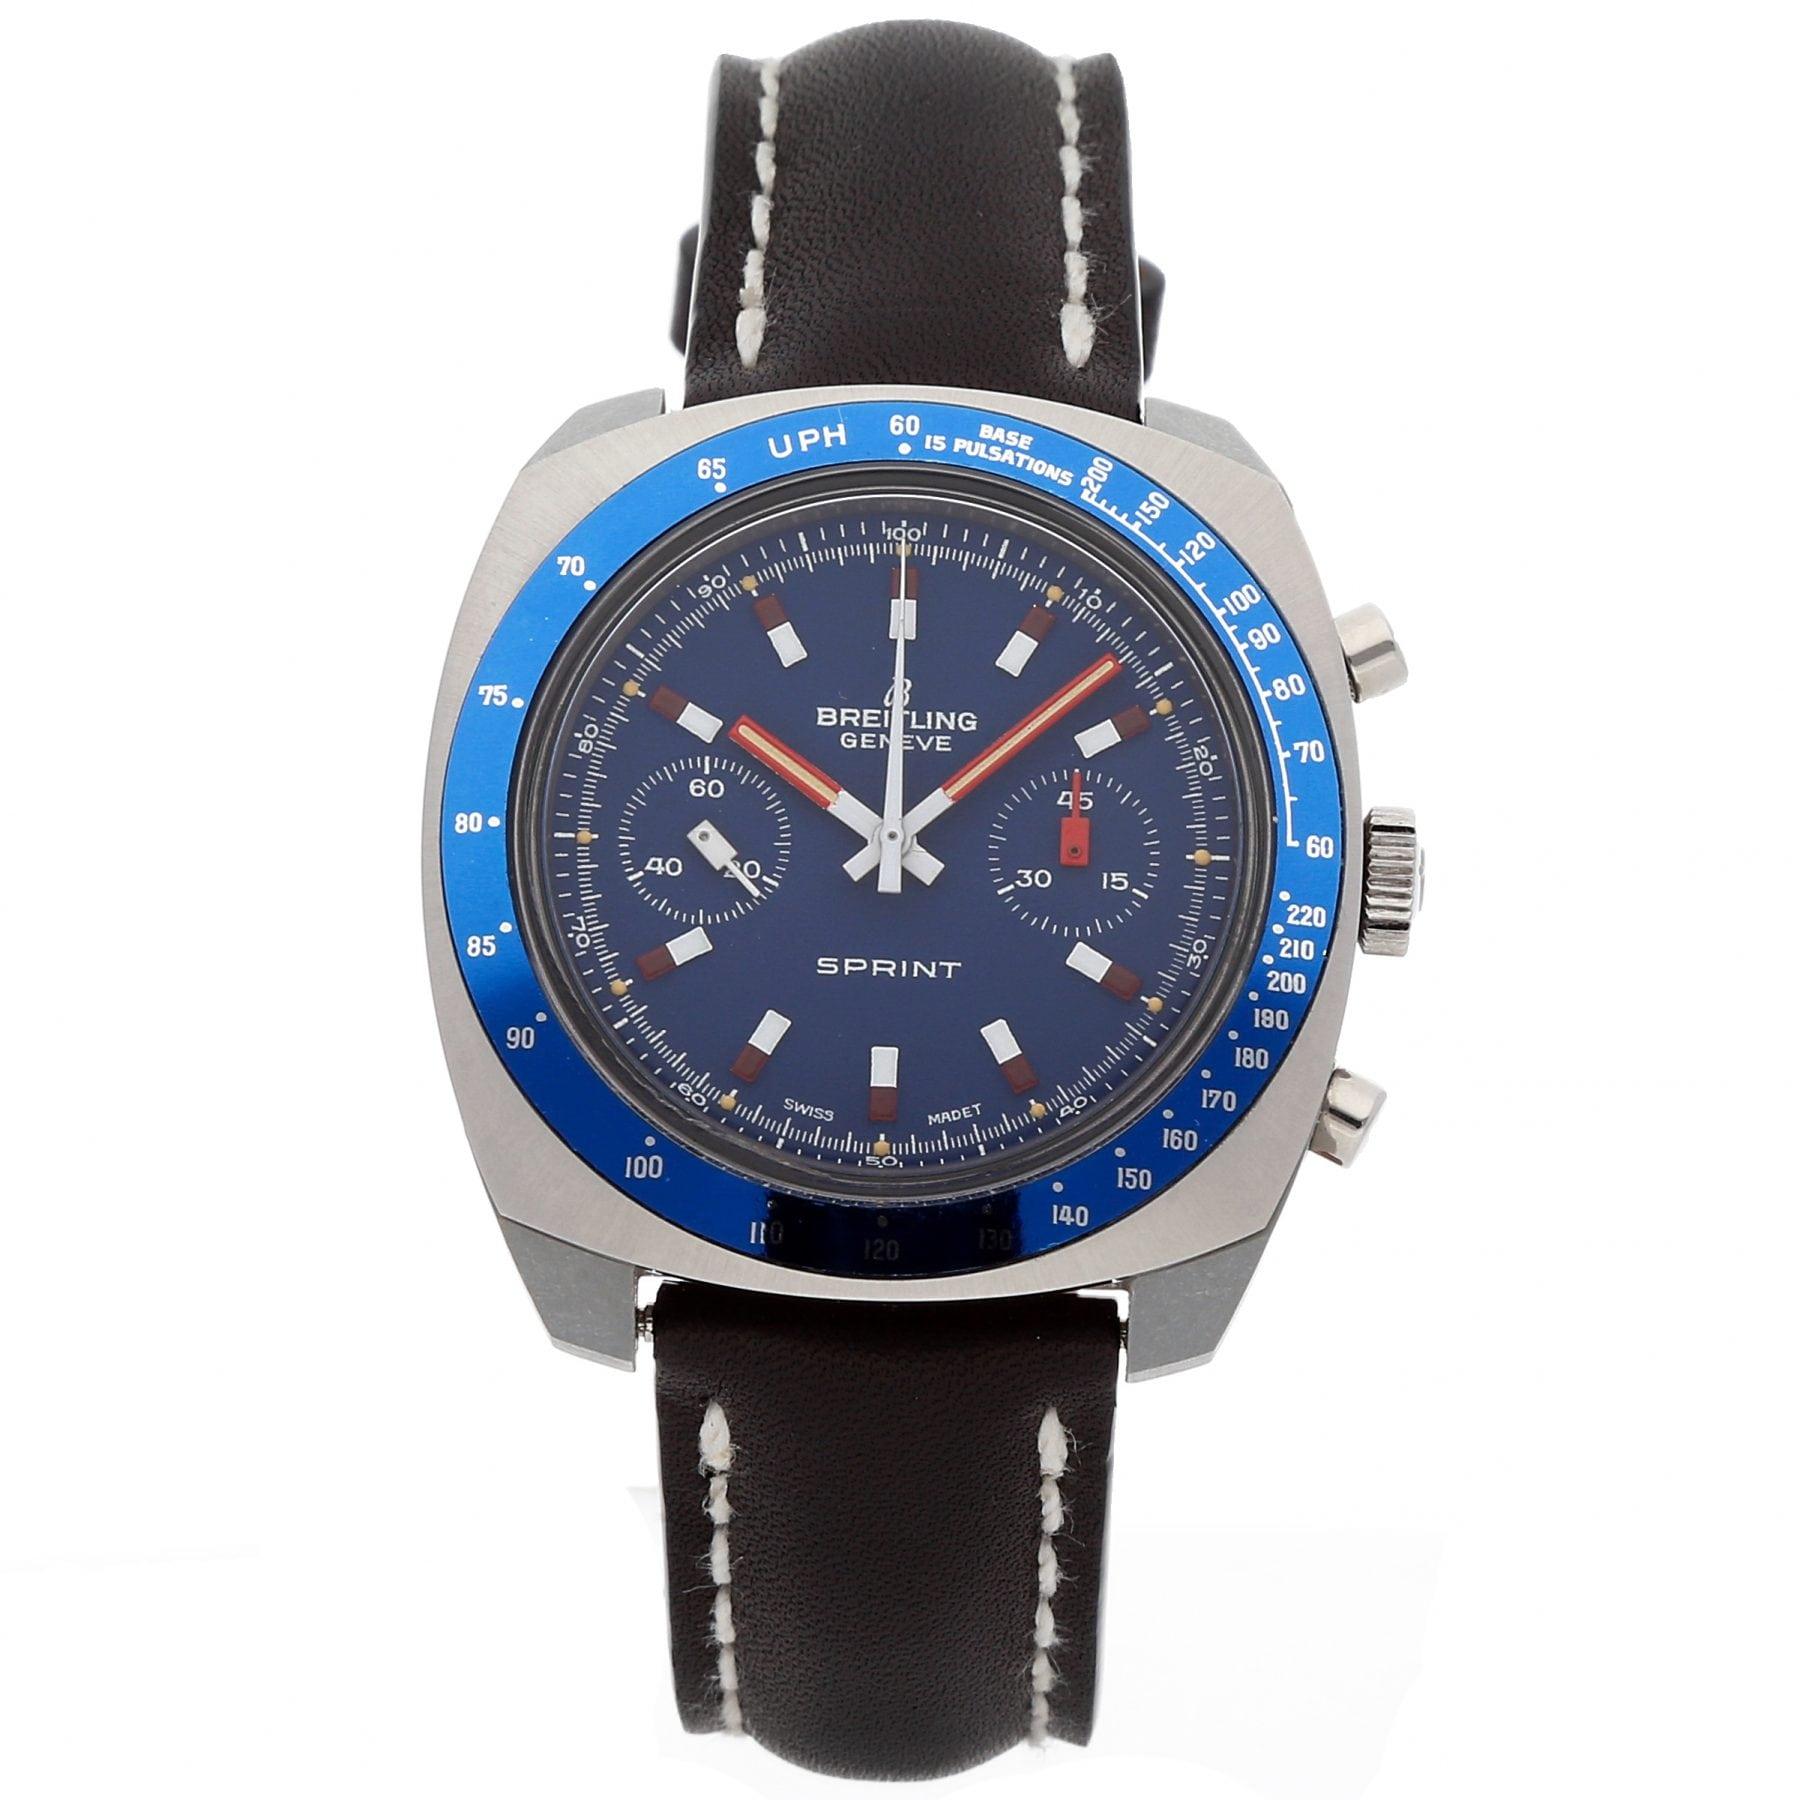 WatchBox Global Timepieces Breitling Sprint Watch